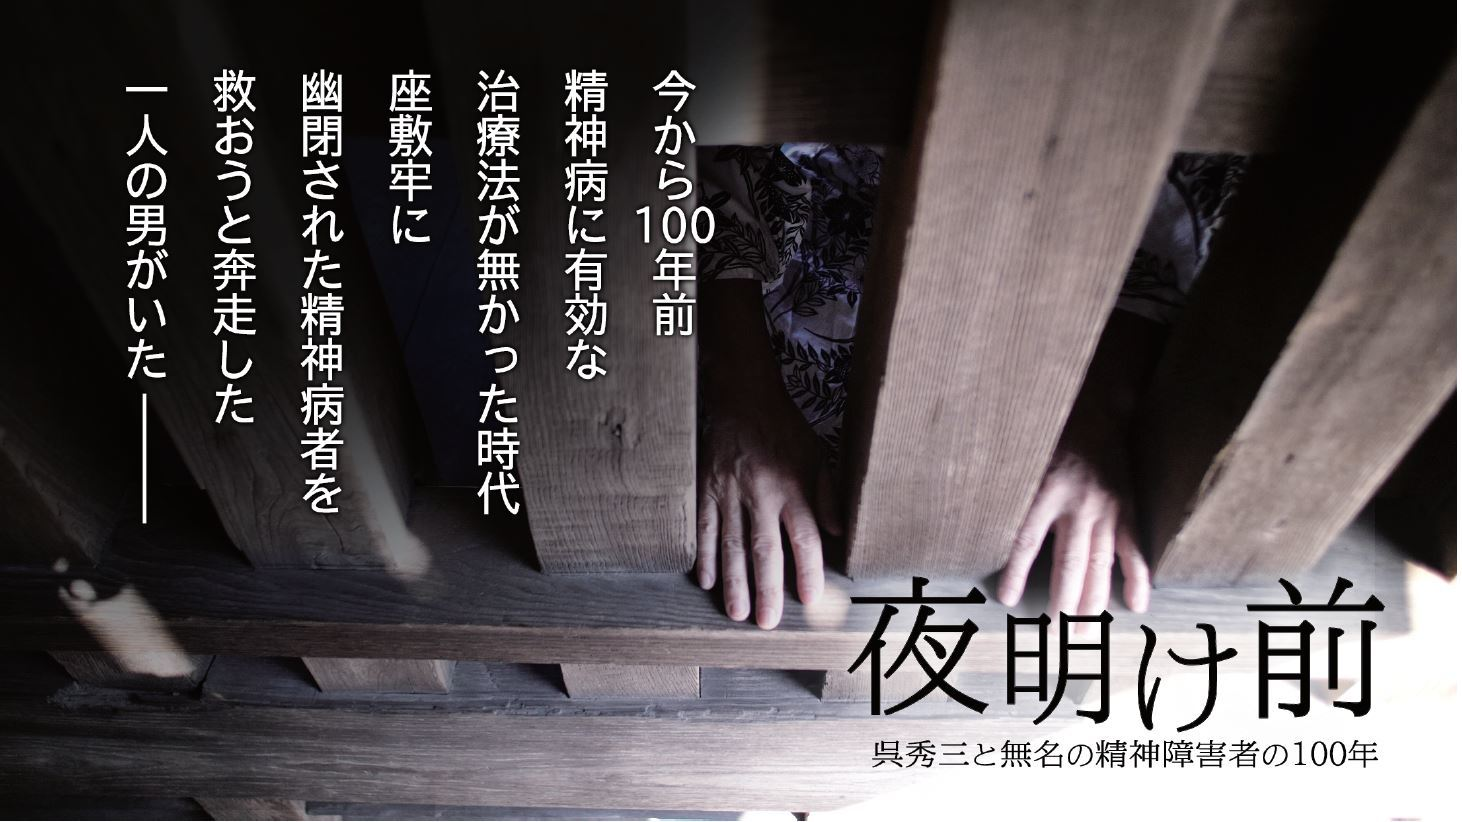 kure_title.jpg